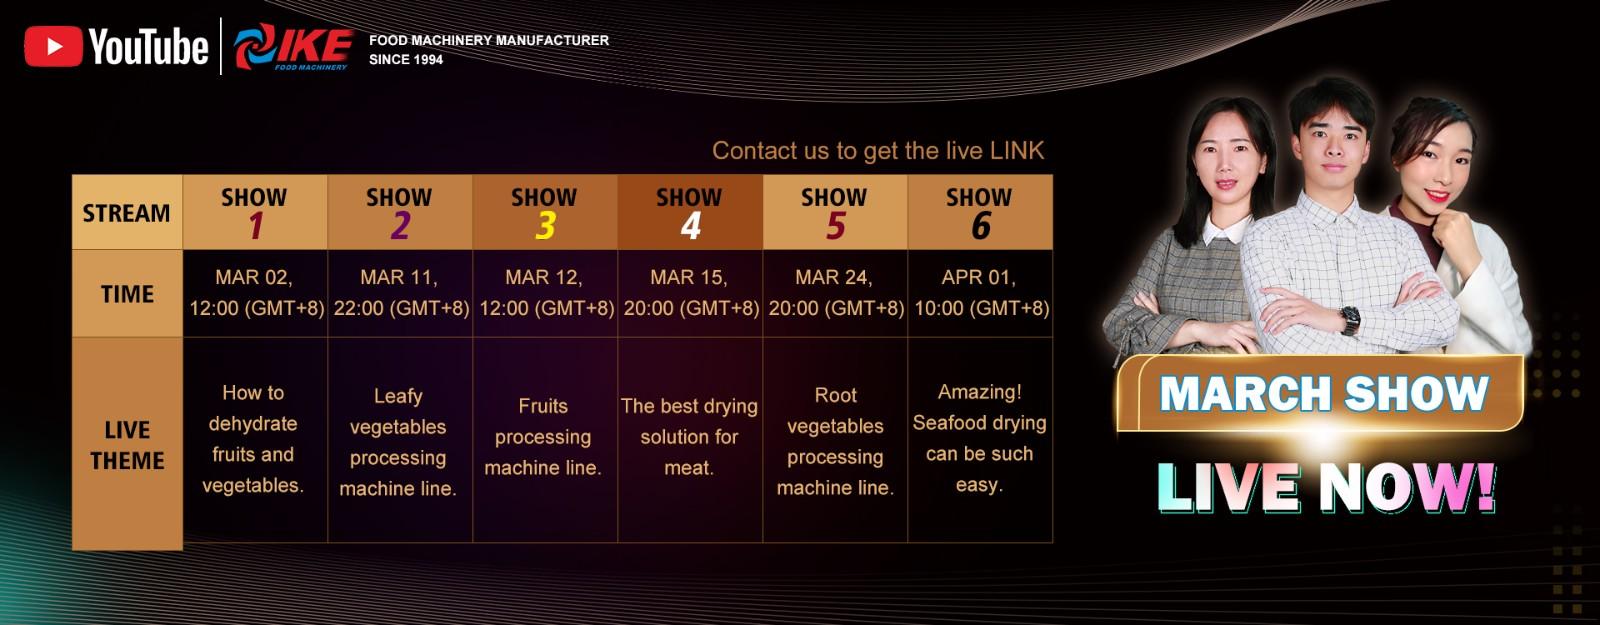 news-IKE-March Live Stream Of IKE Food Machinery-img